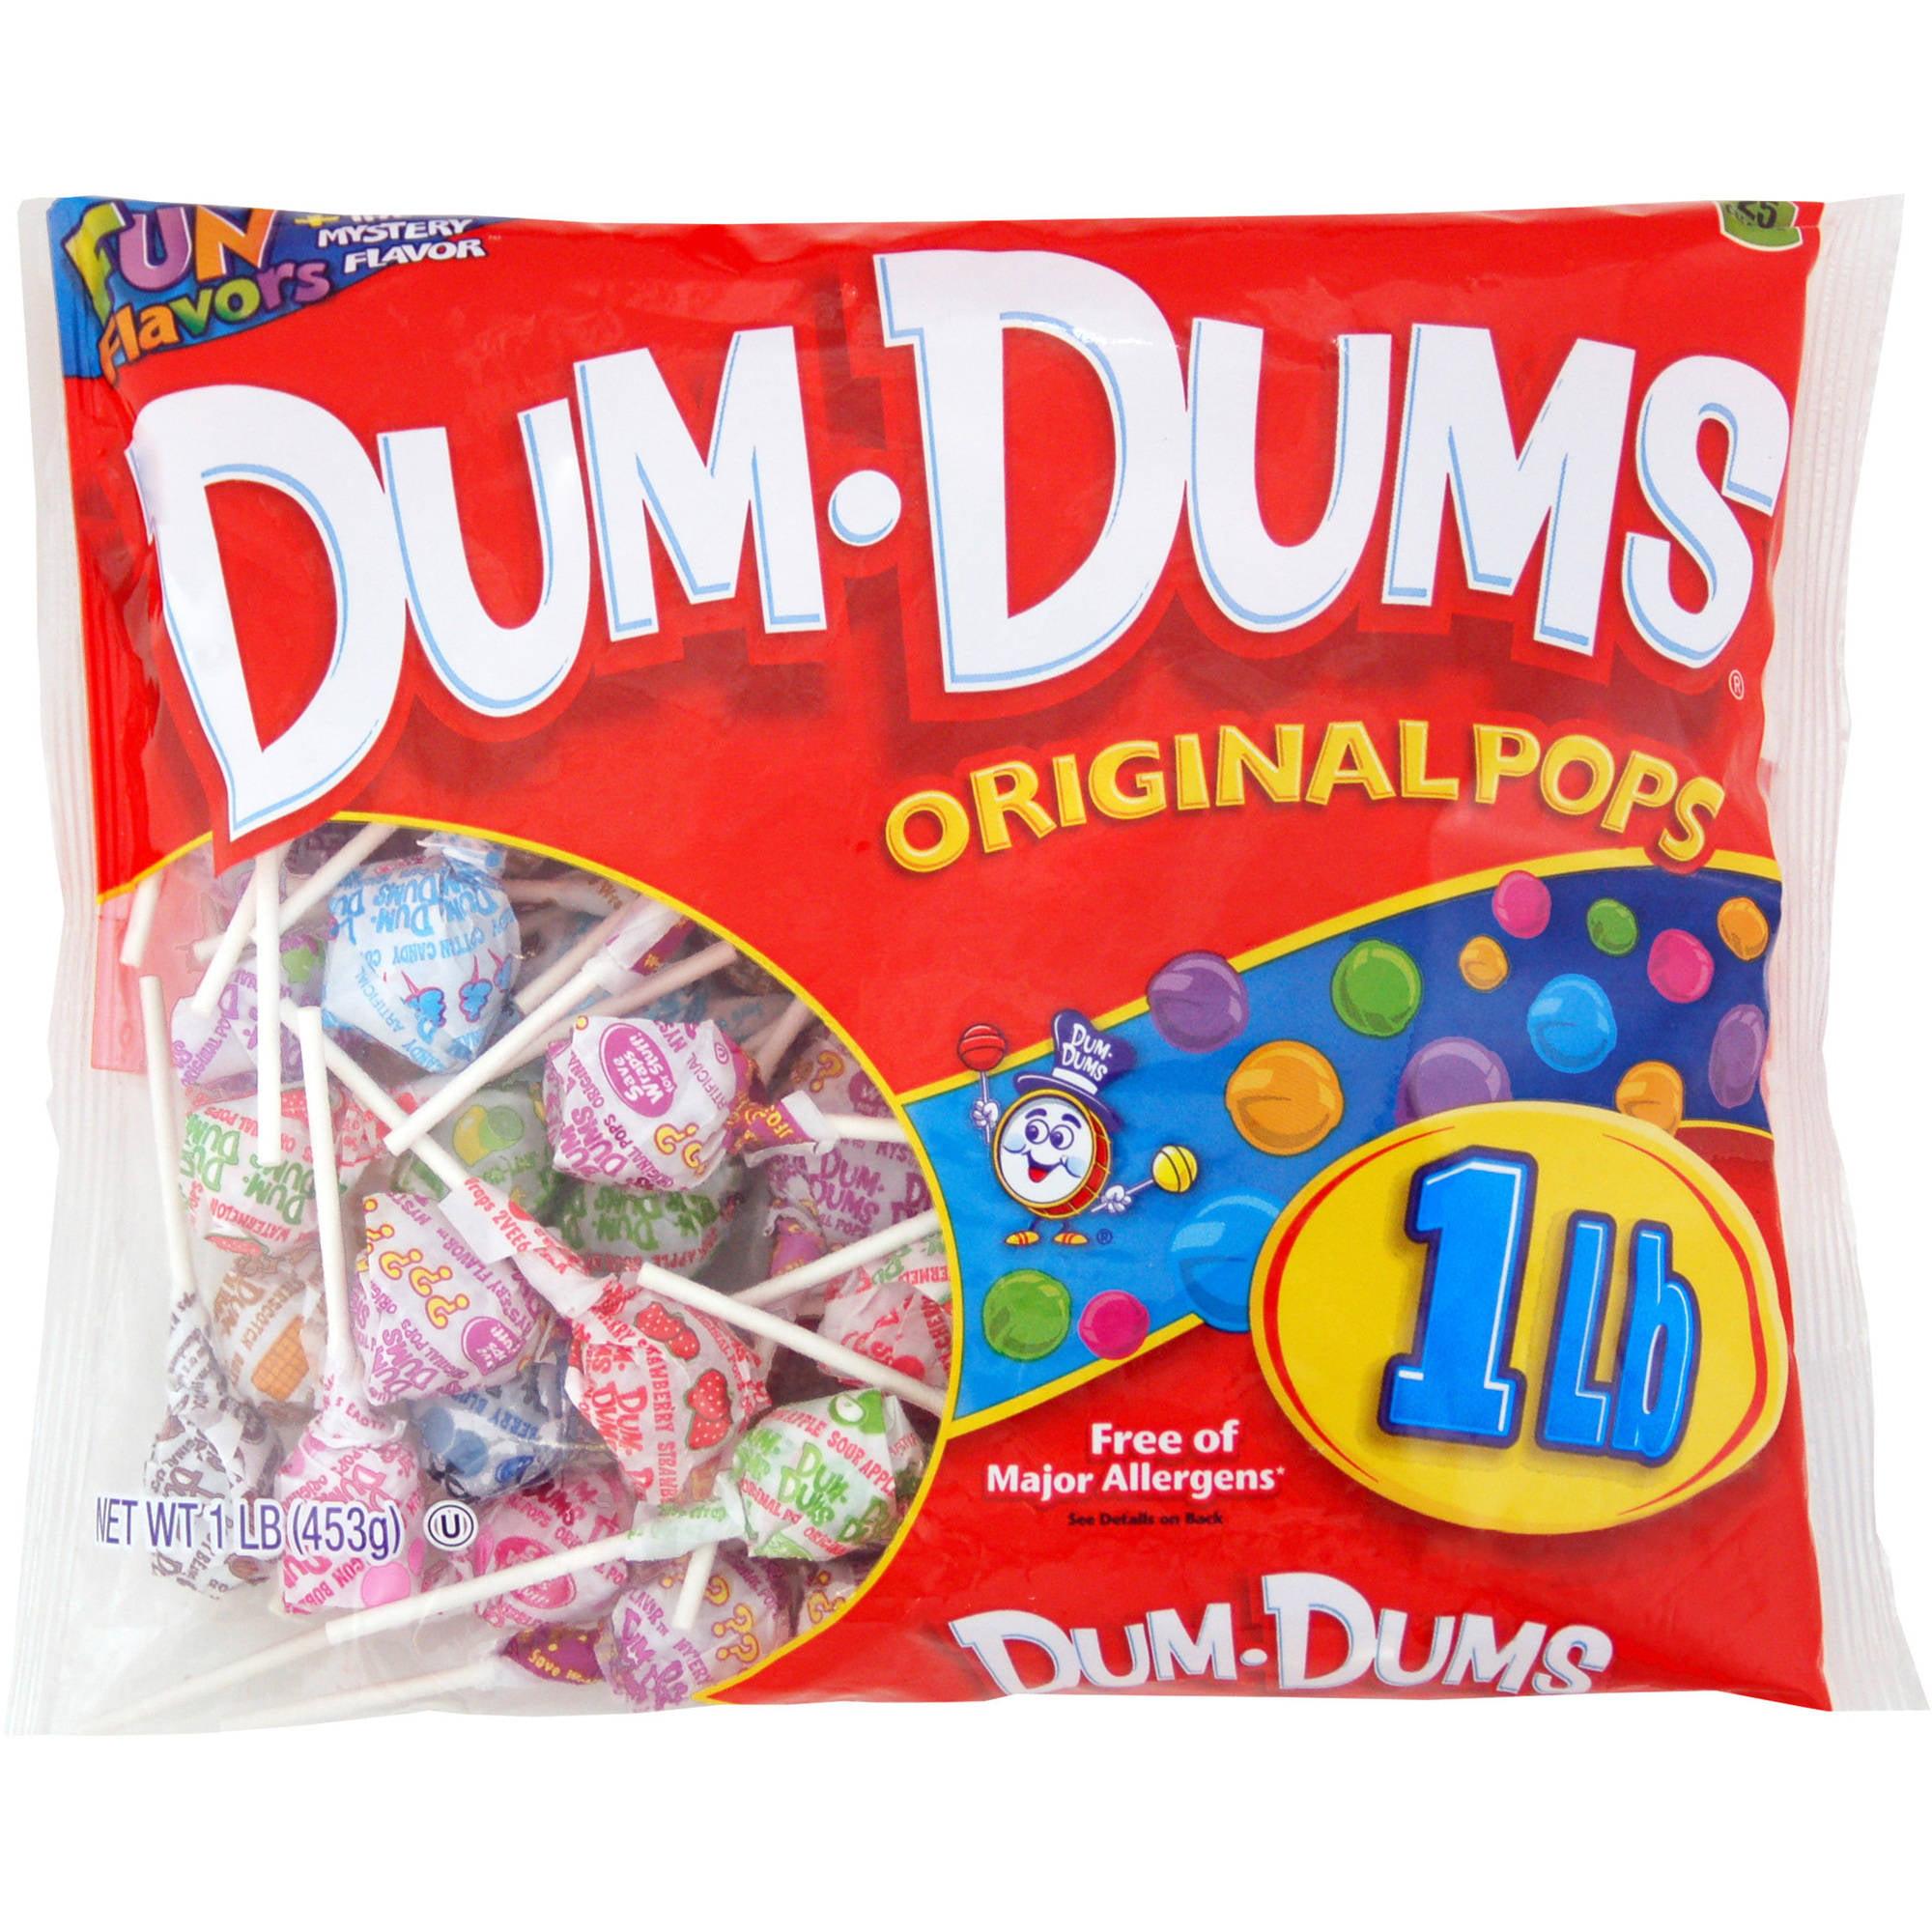 Spangler Candy Co. Dum Dum Pops, 1 Lb Bag